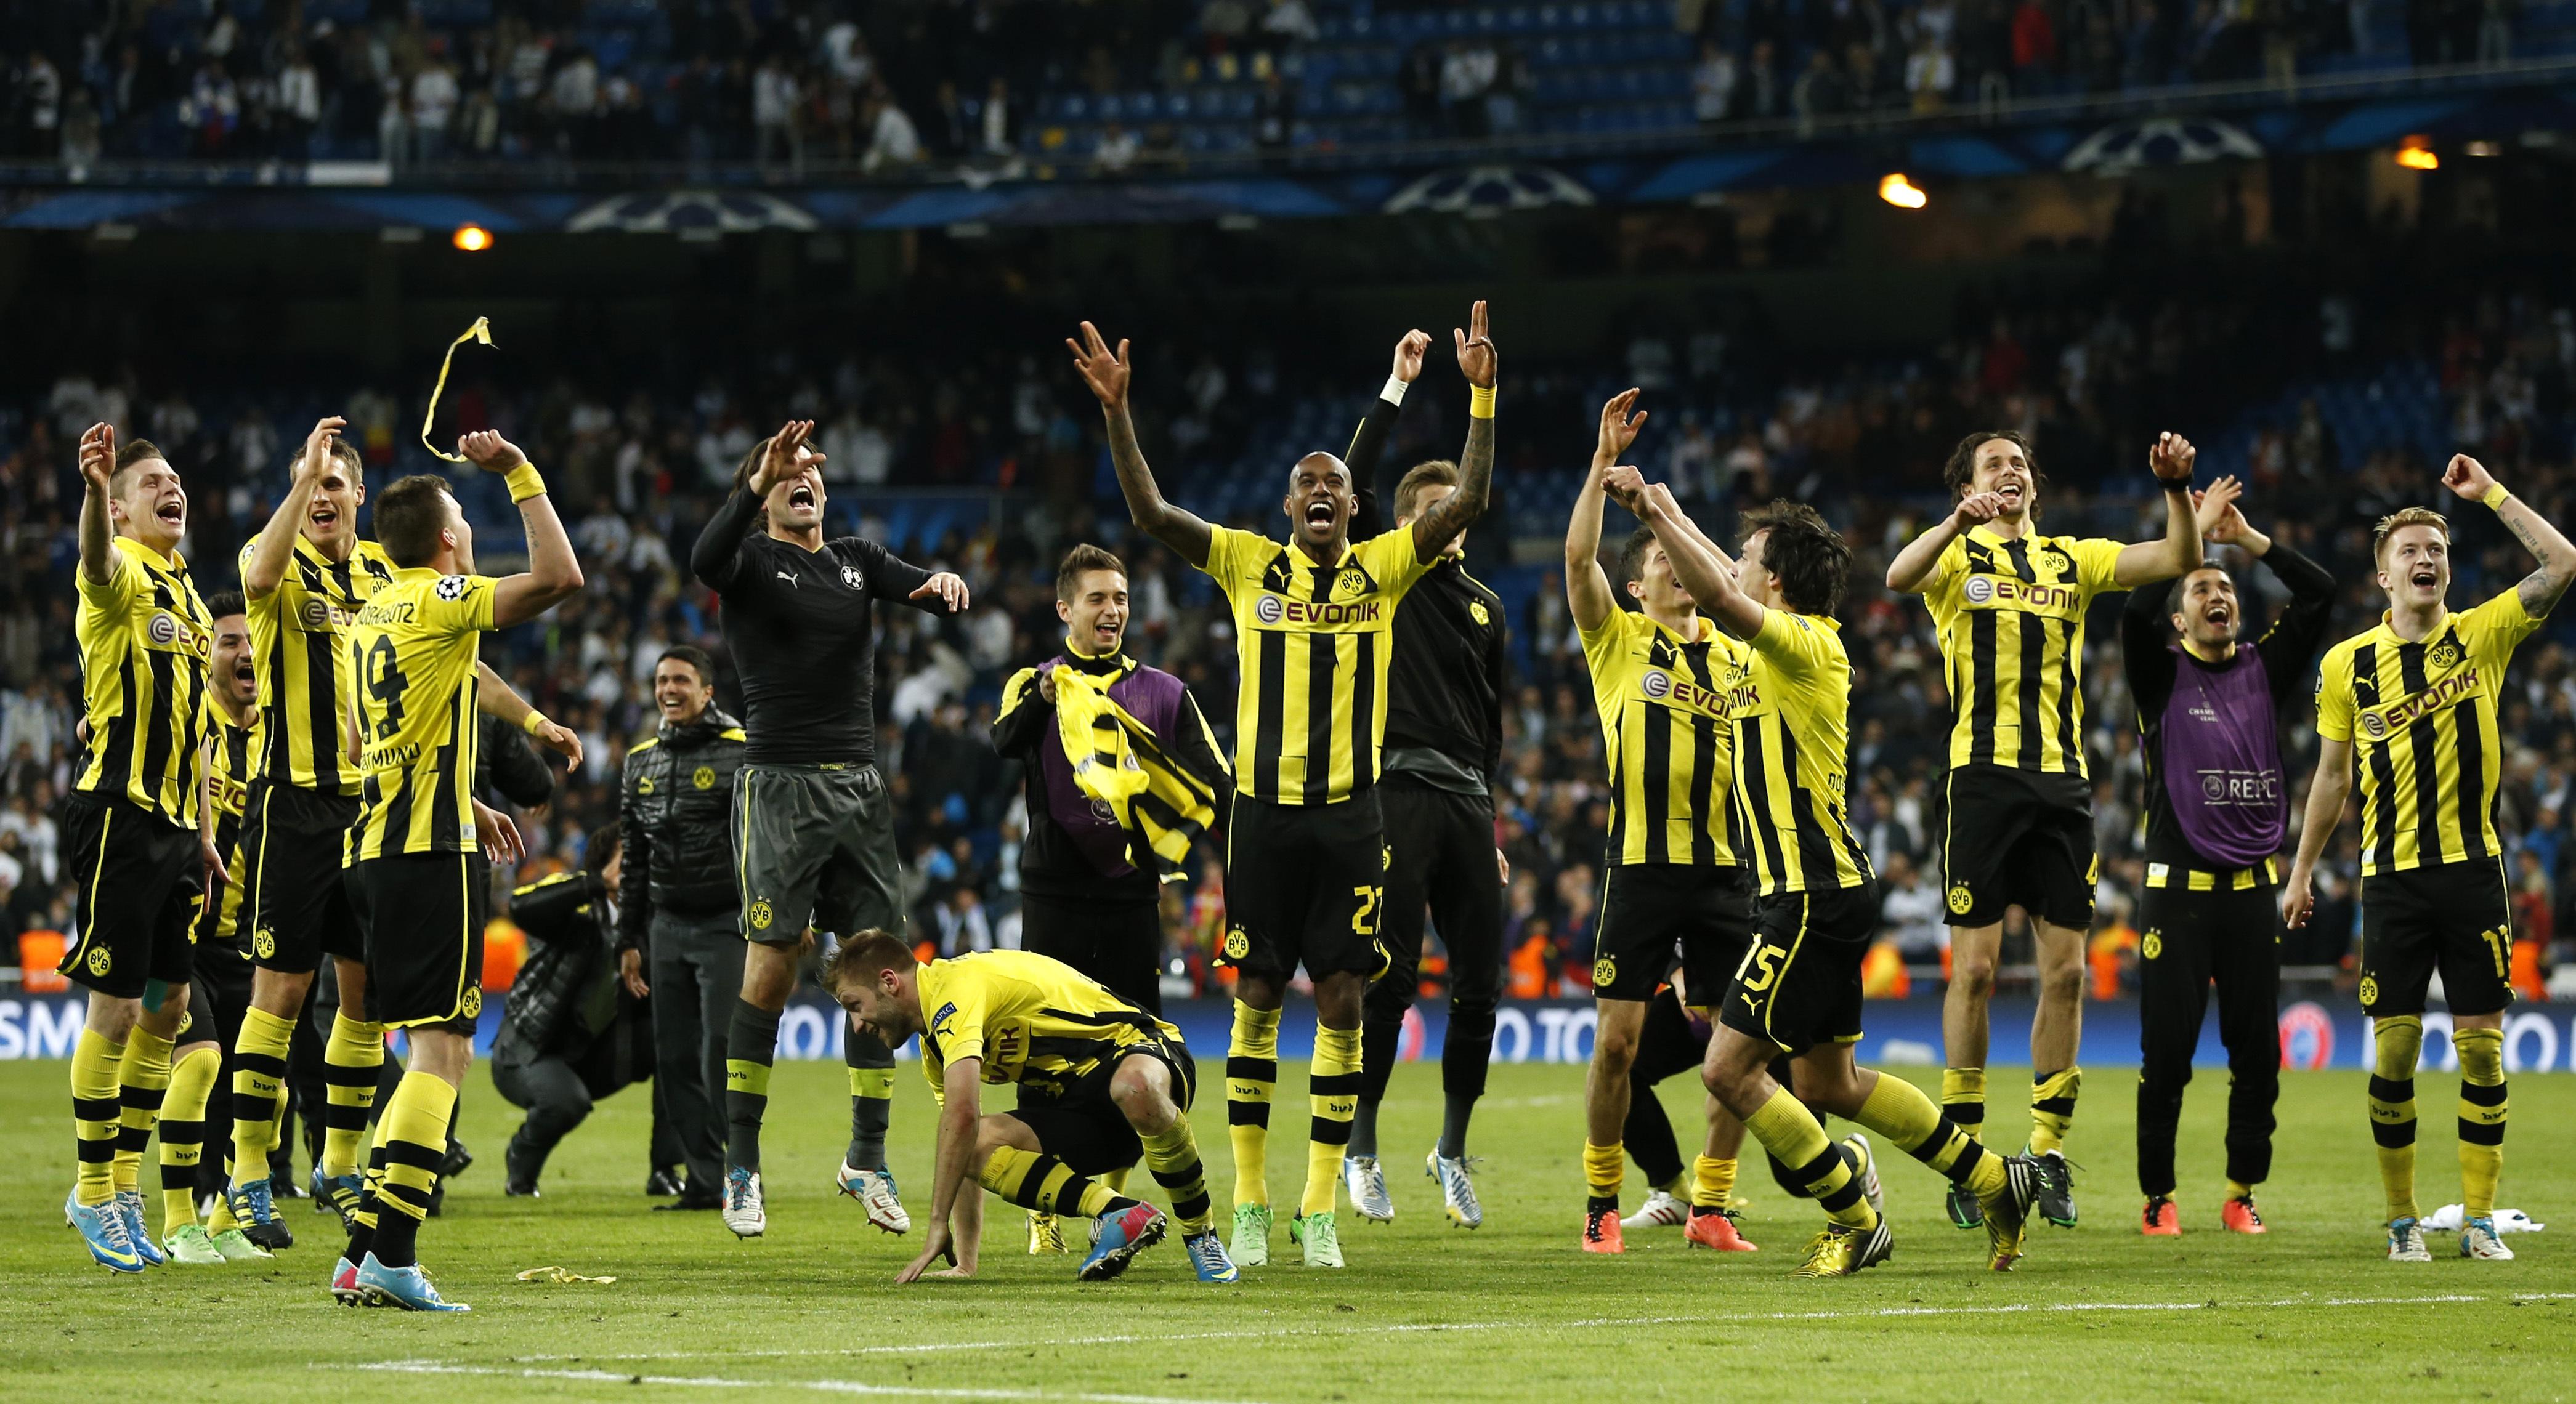 Borussia Dortmund High Definition